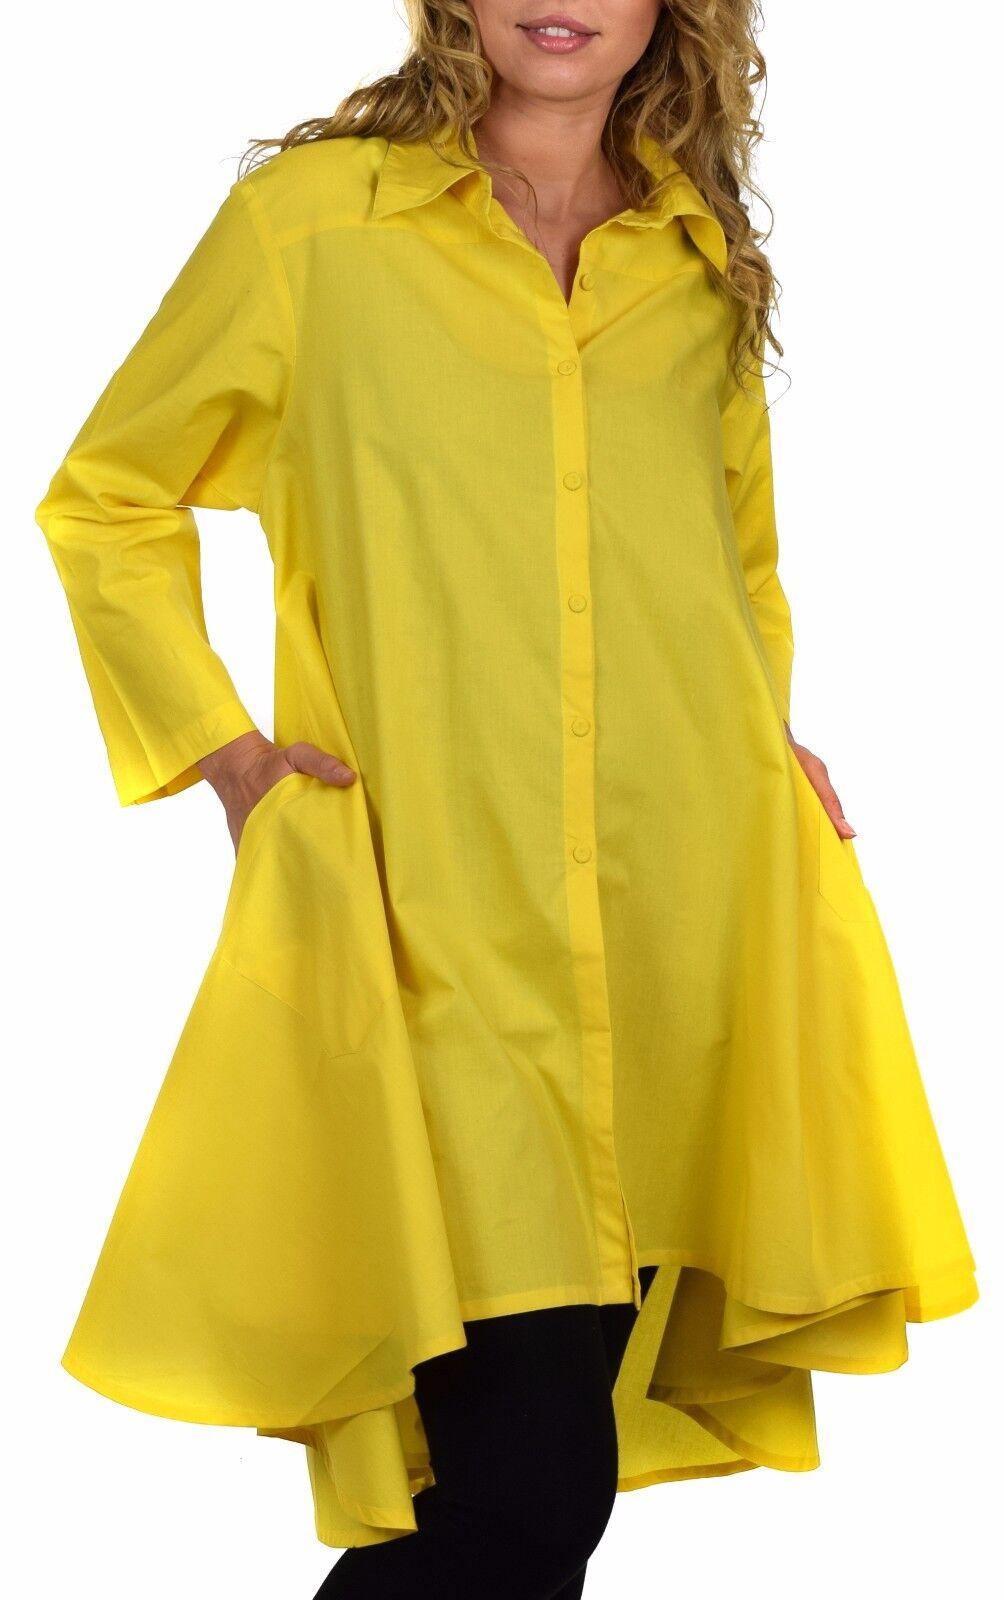 Woherren Hi Low Button Down A Line Swing Dress Shirt Top Reg and Plus Größe Gelb